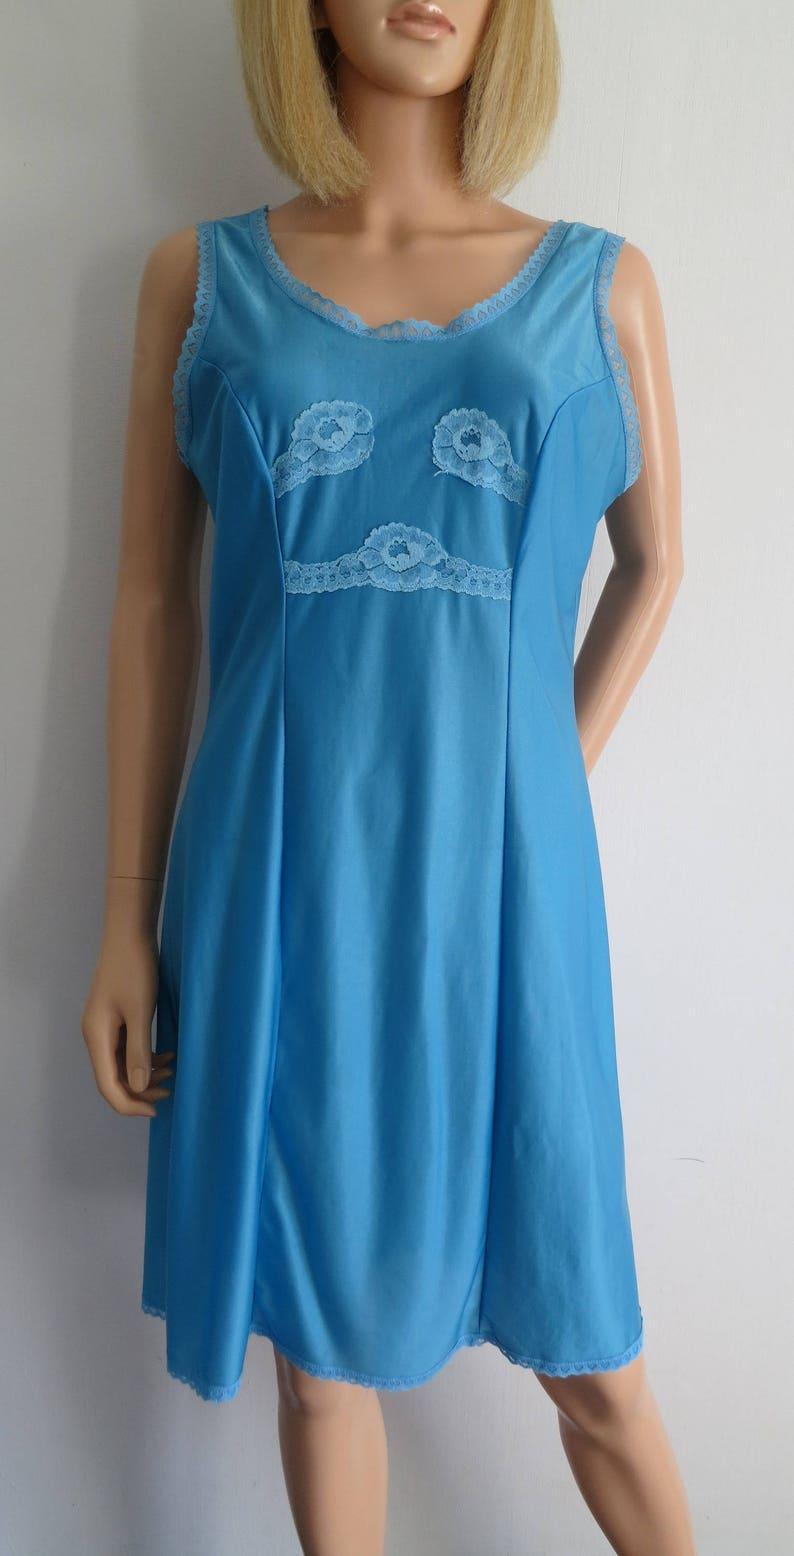 sleeveless pygamas Blue silky night dress french vintage retro sleeping dress knee length